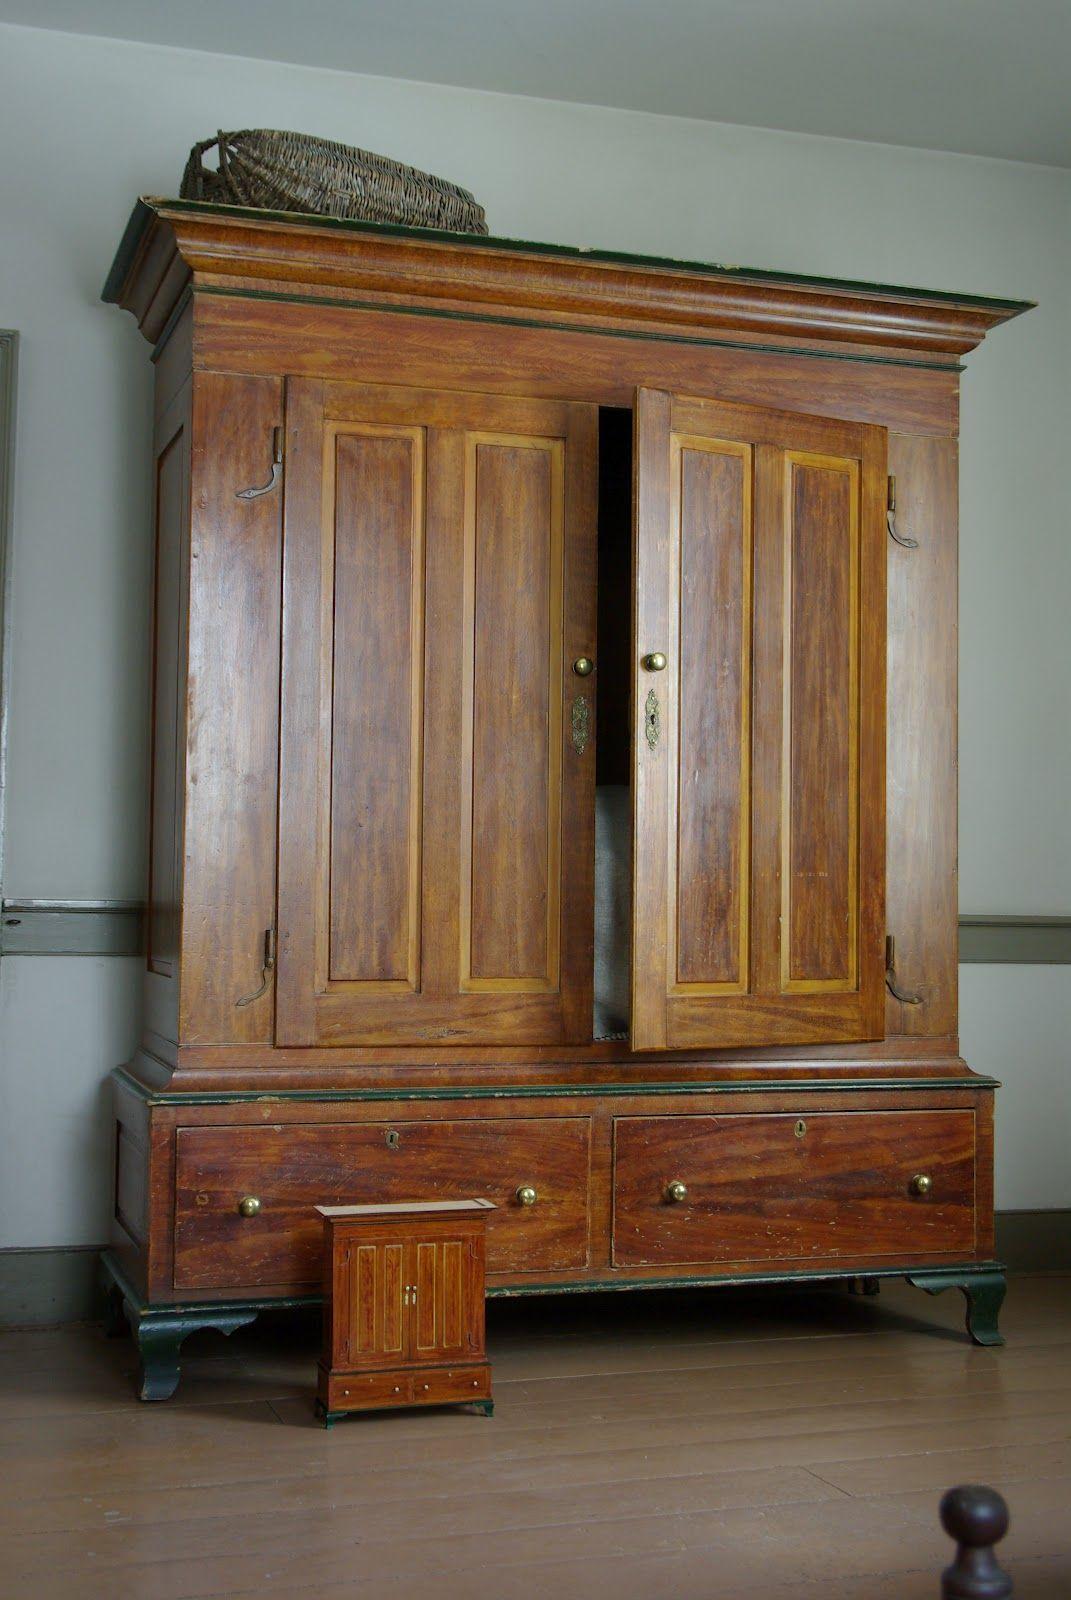 pennsylvania german furniture - Google Search